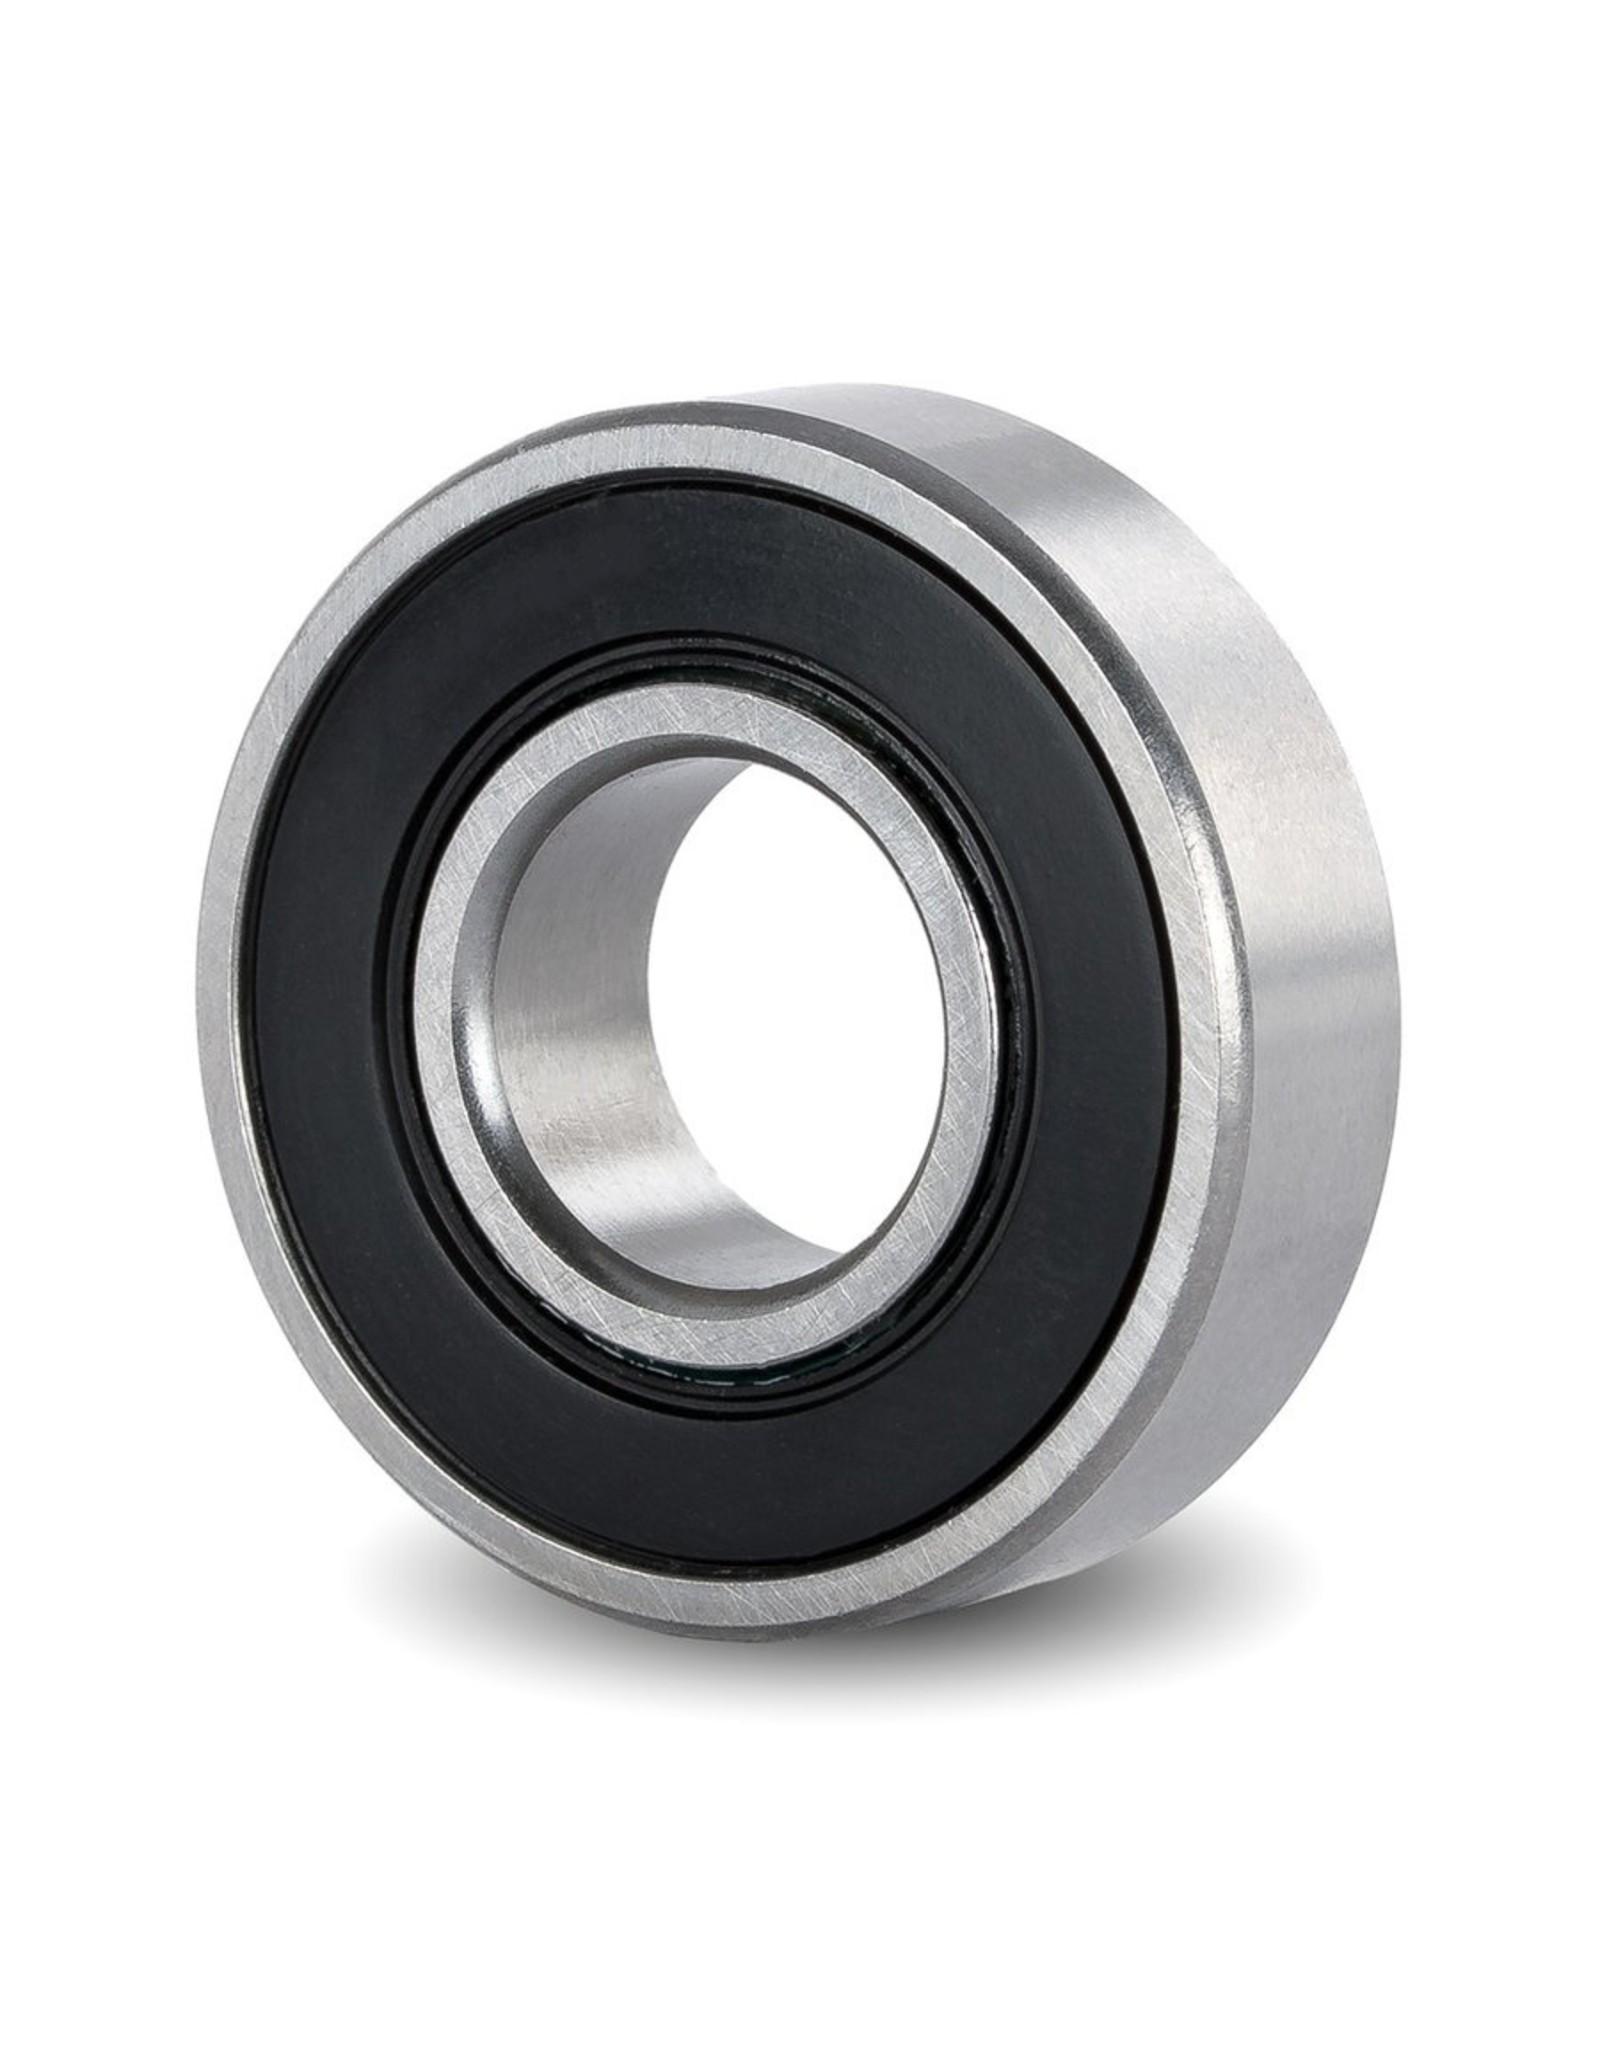 Ball bearing 6000 (10 units/bag)